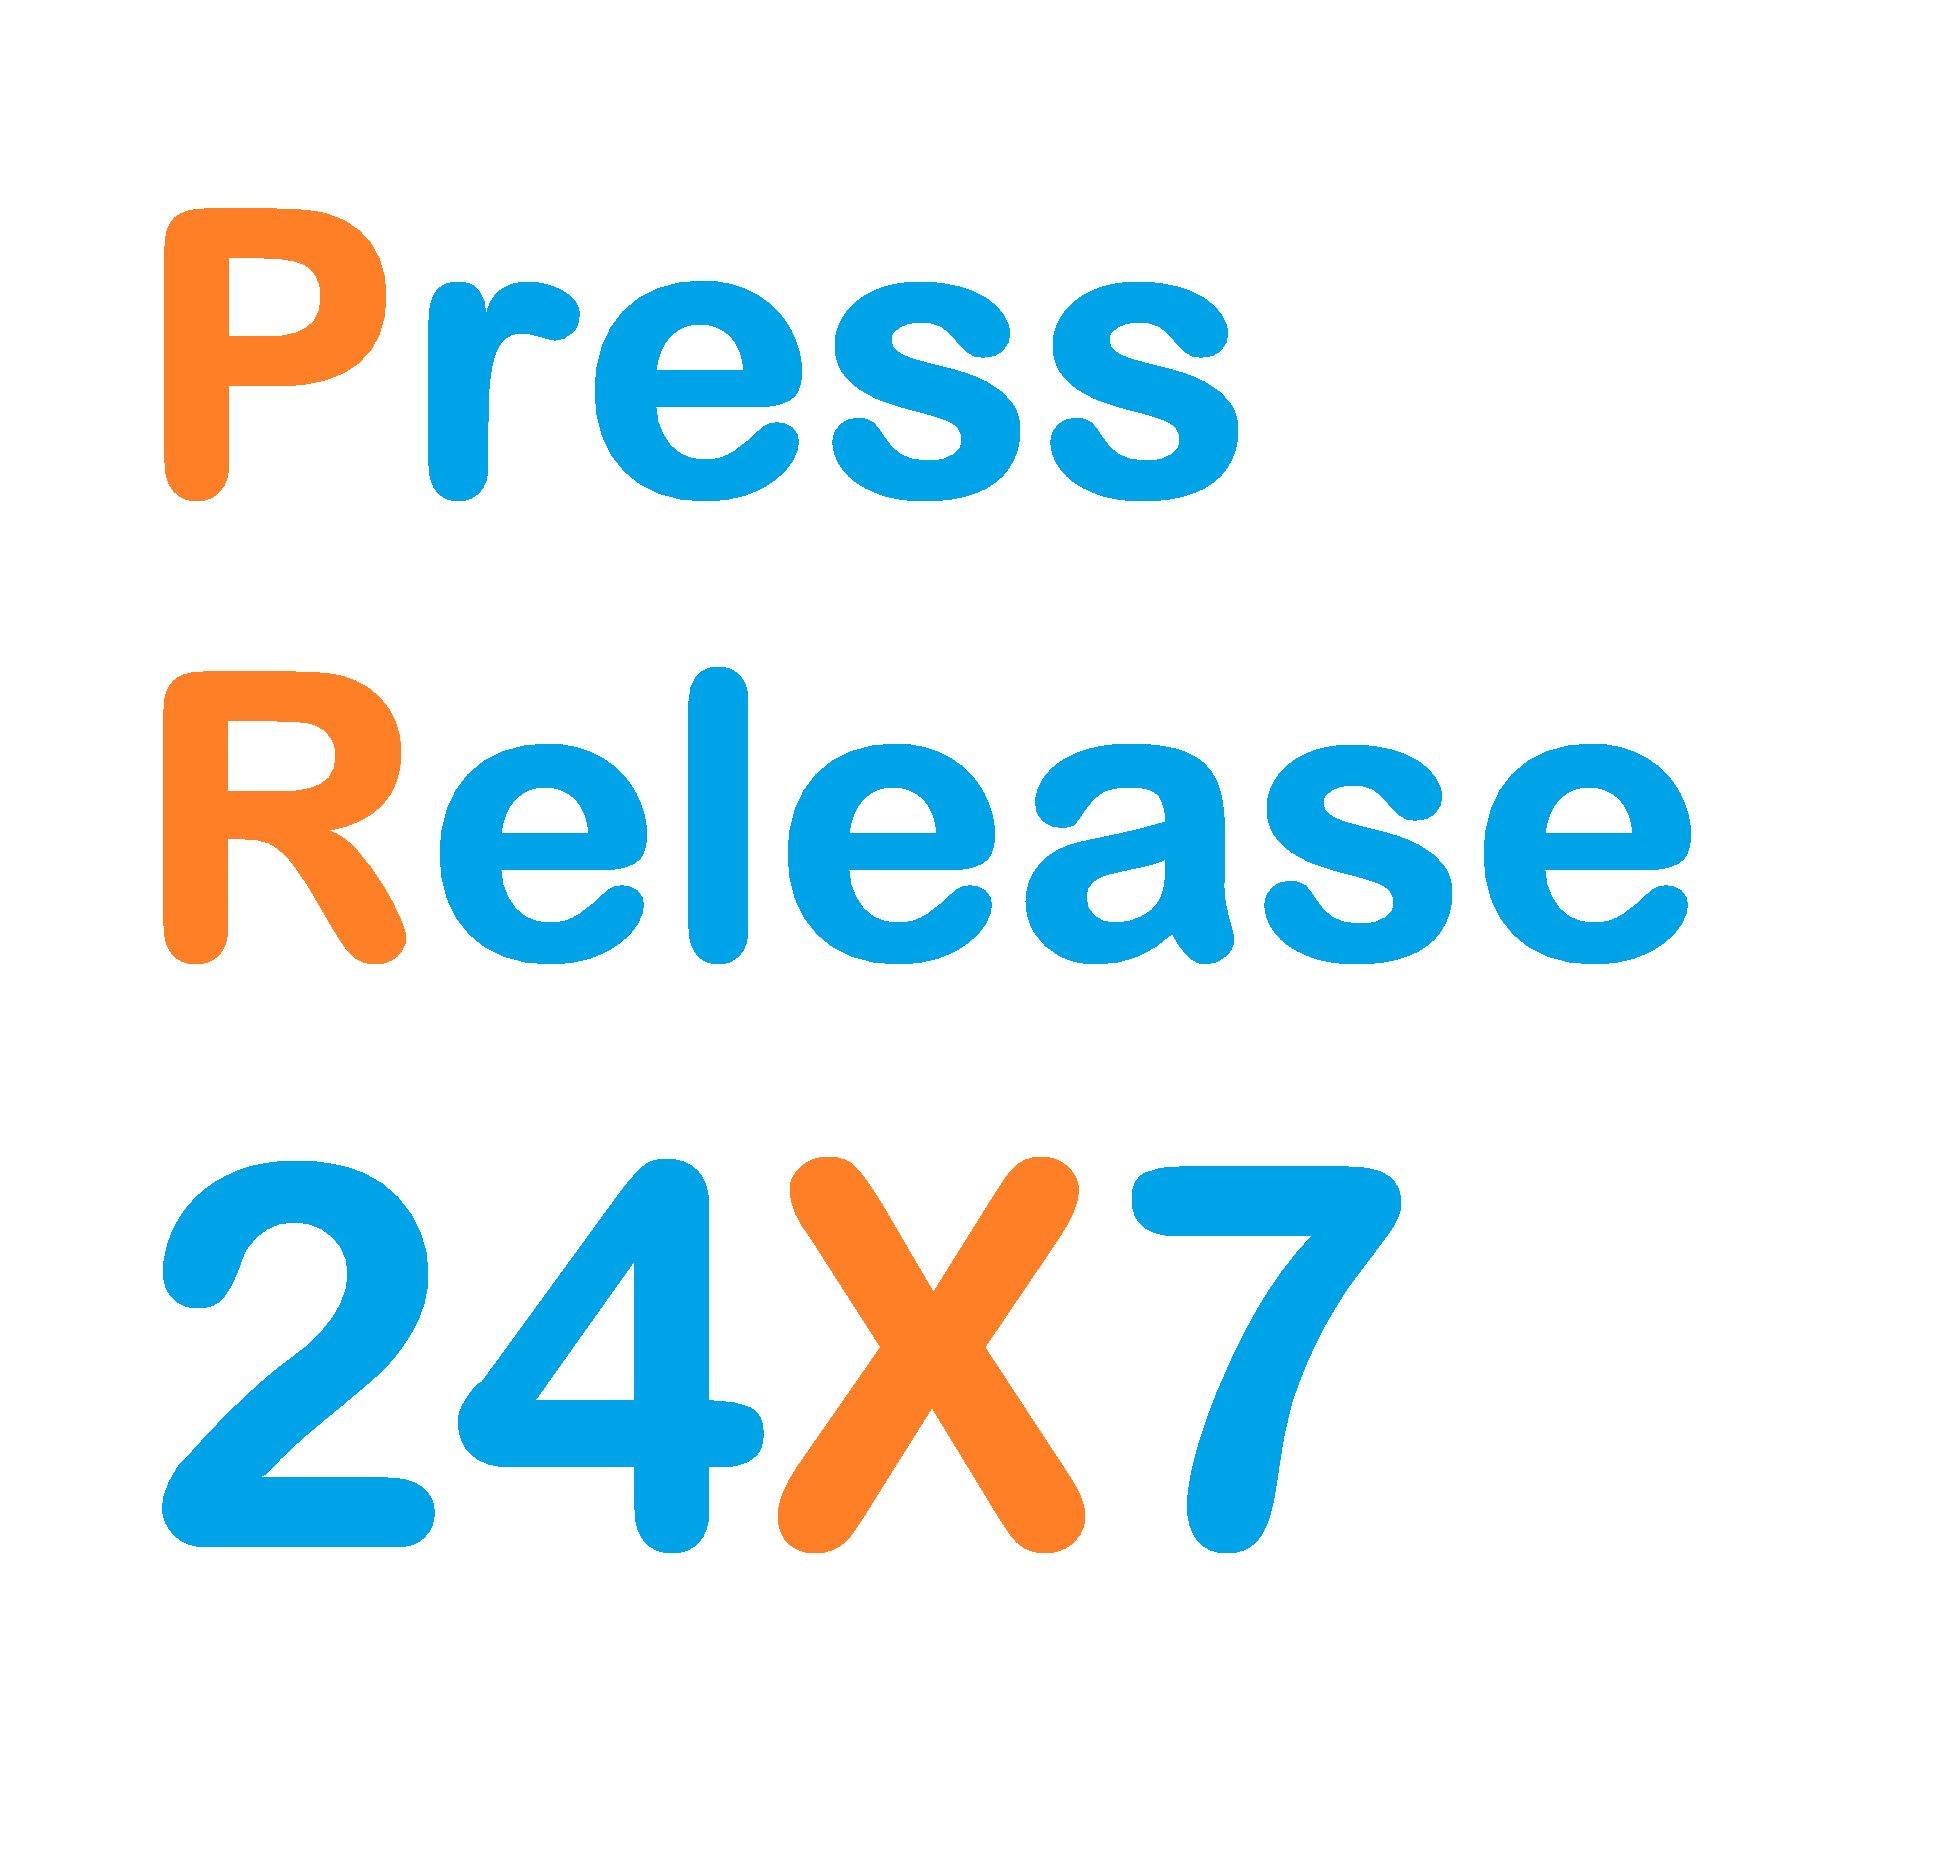 Press Release 24x7